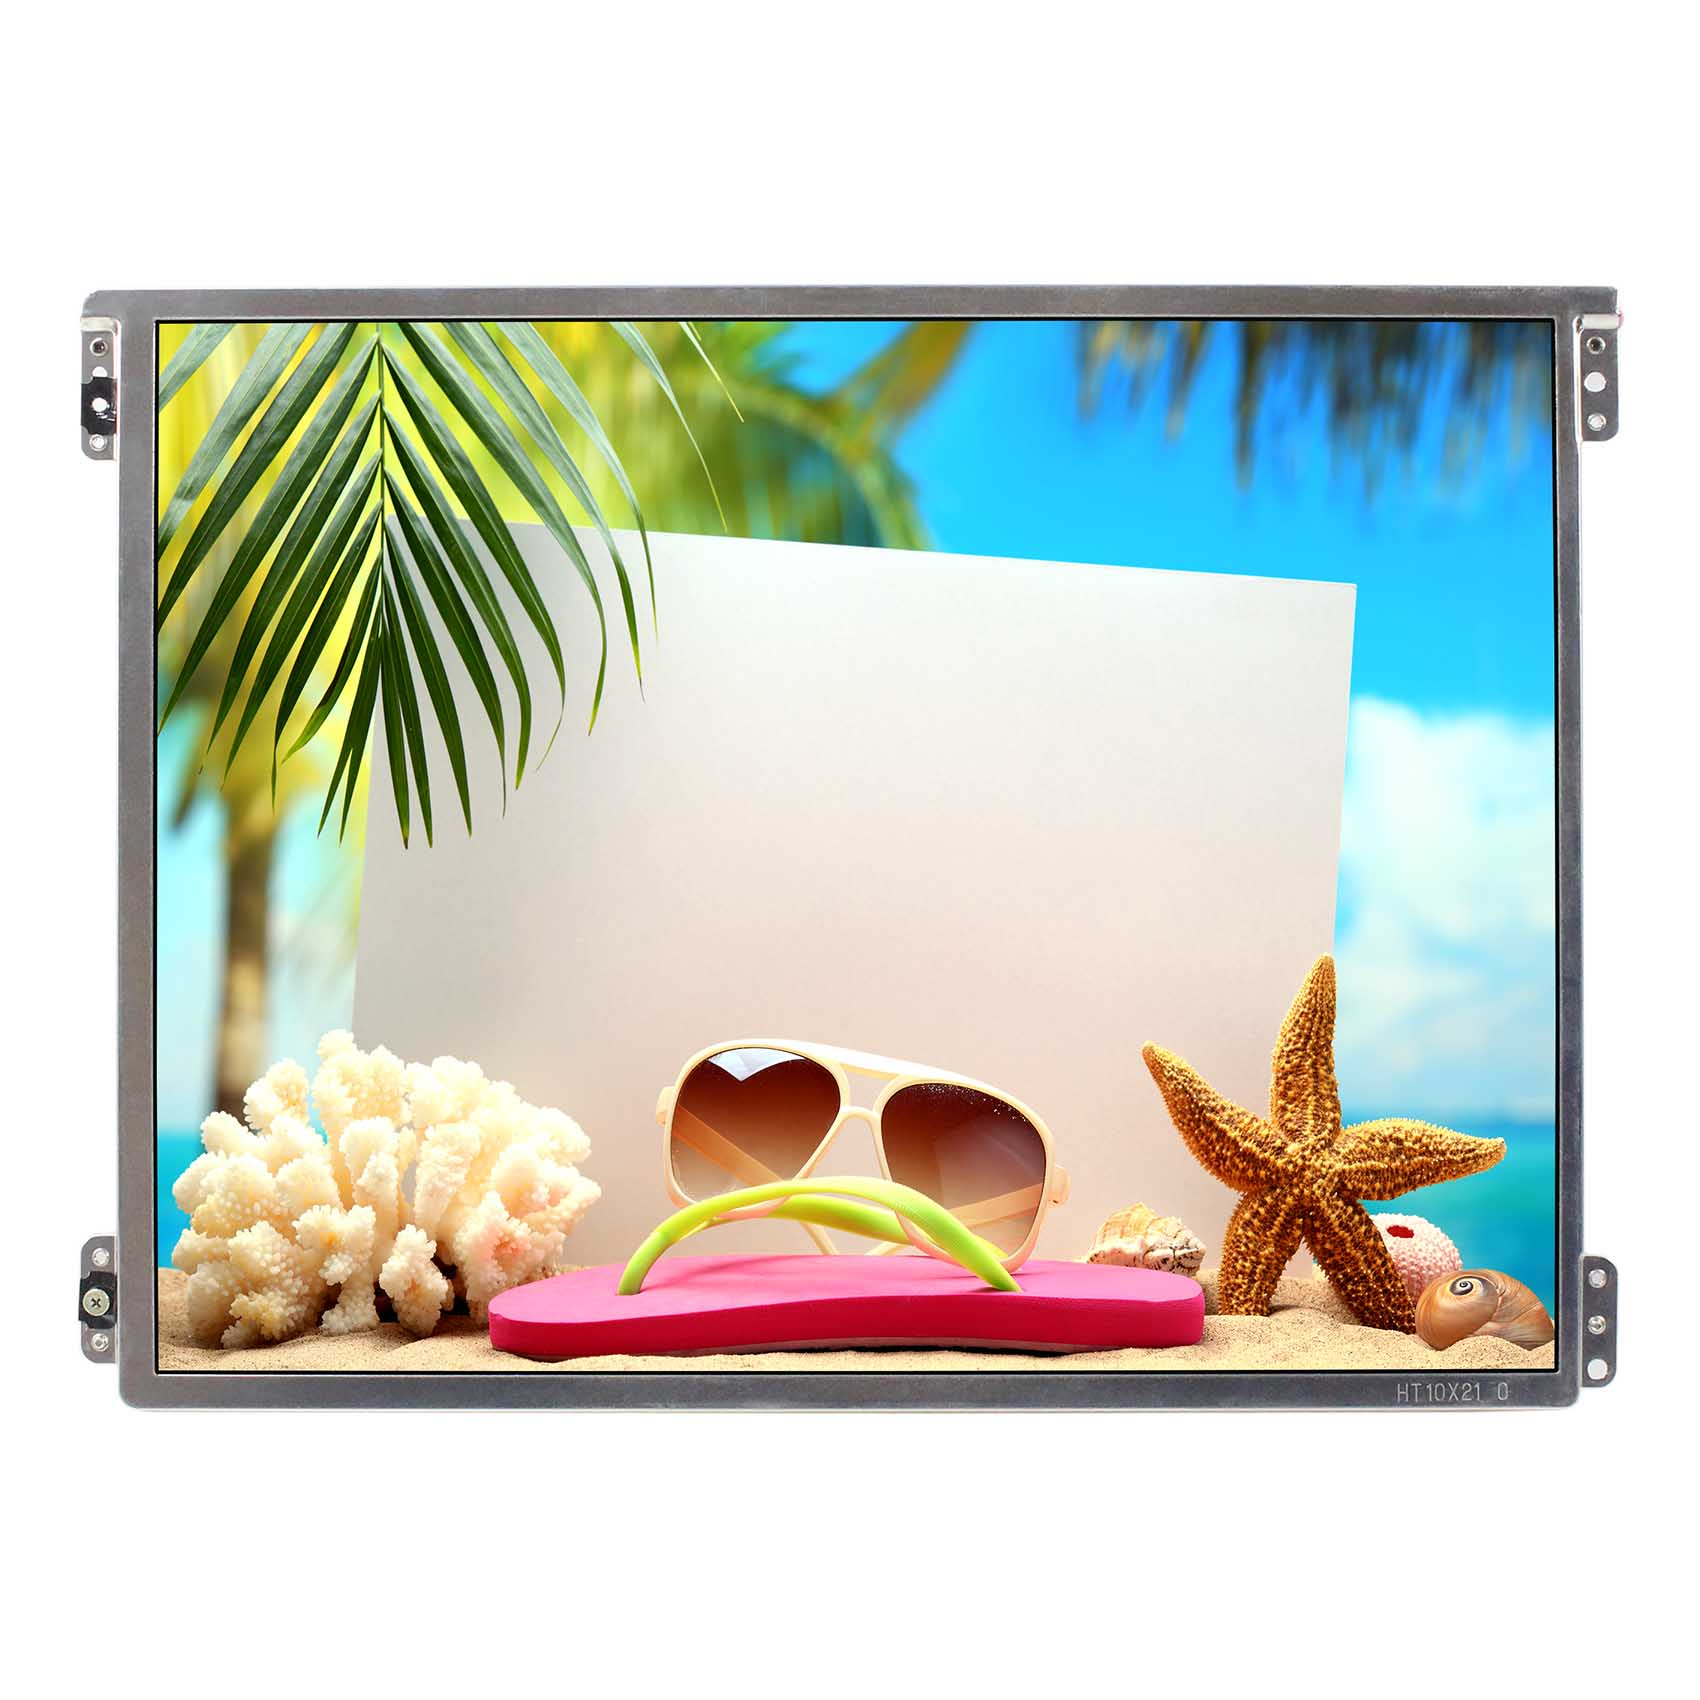 Pantalla LCD IPS de 10,4 pulgadas HT10X21-311 1024X768